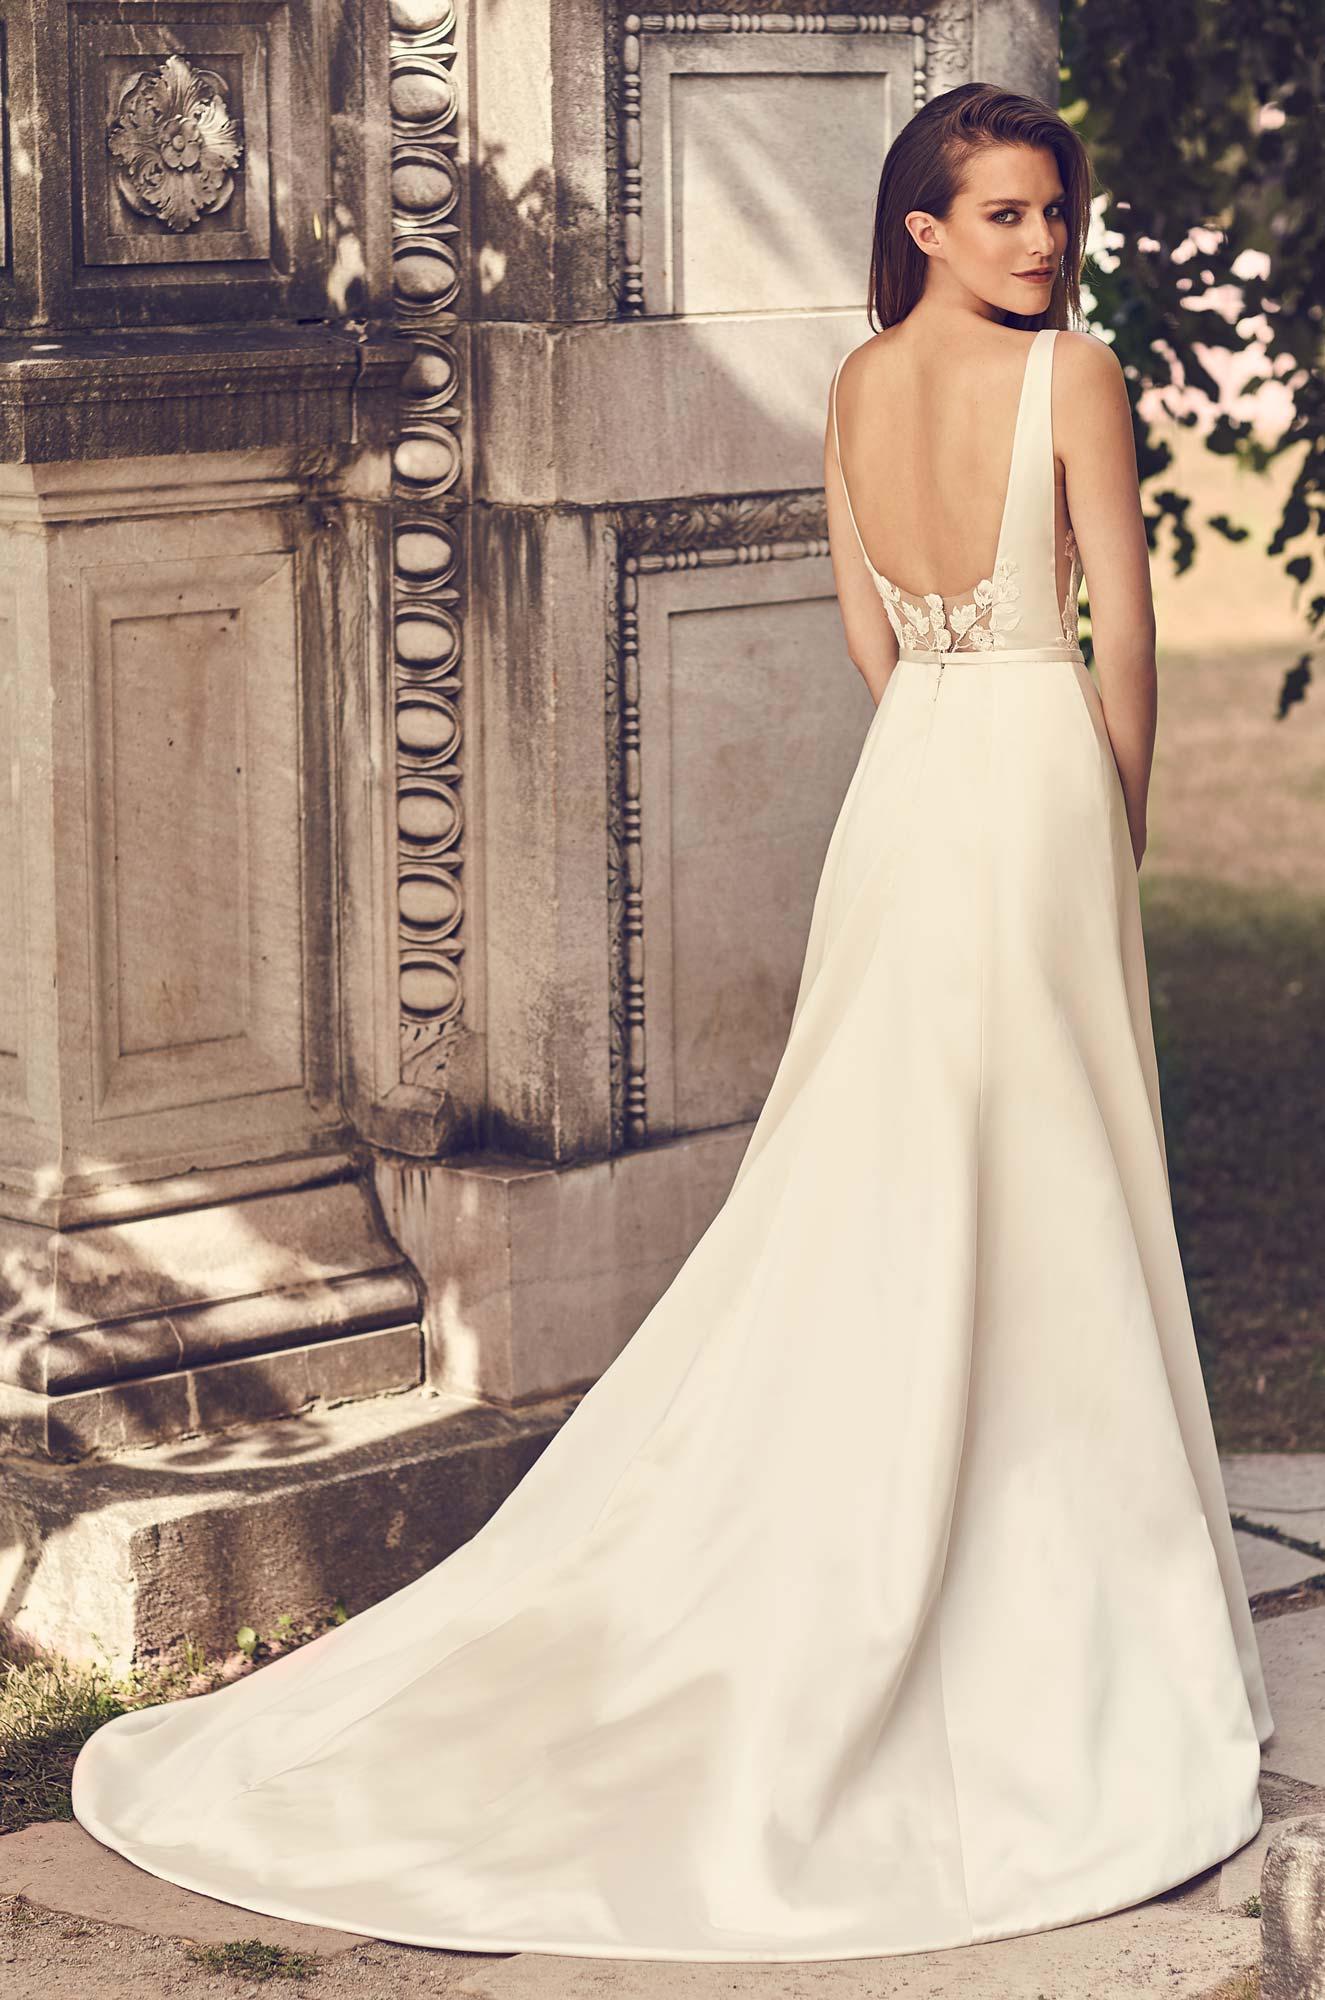 Flattering Duchesse Satin Wedding Dress - Style #2230 | Mikaella Bridal